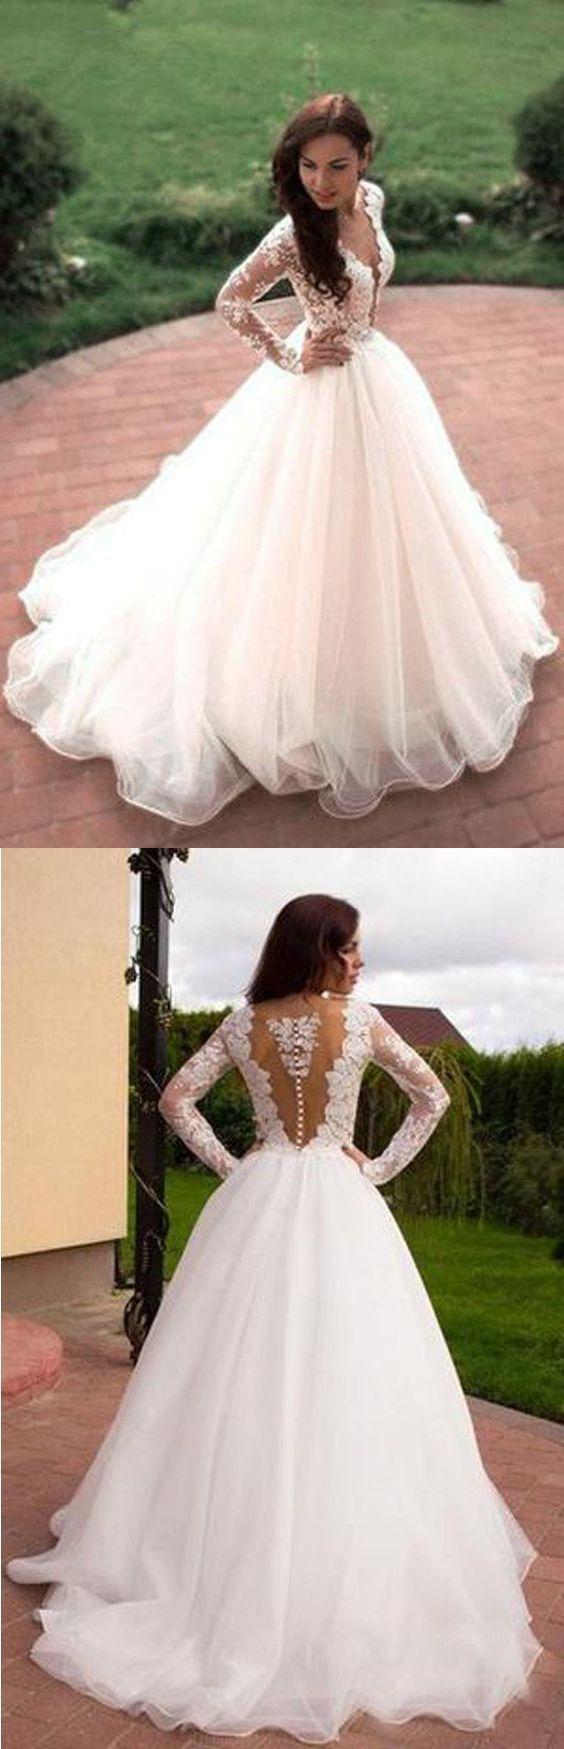 Wedding Dresses 18 #WeddingDresses18, Ivory Wedding Dresses